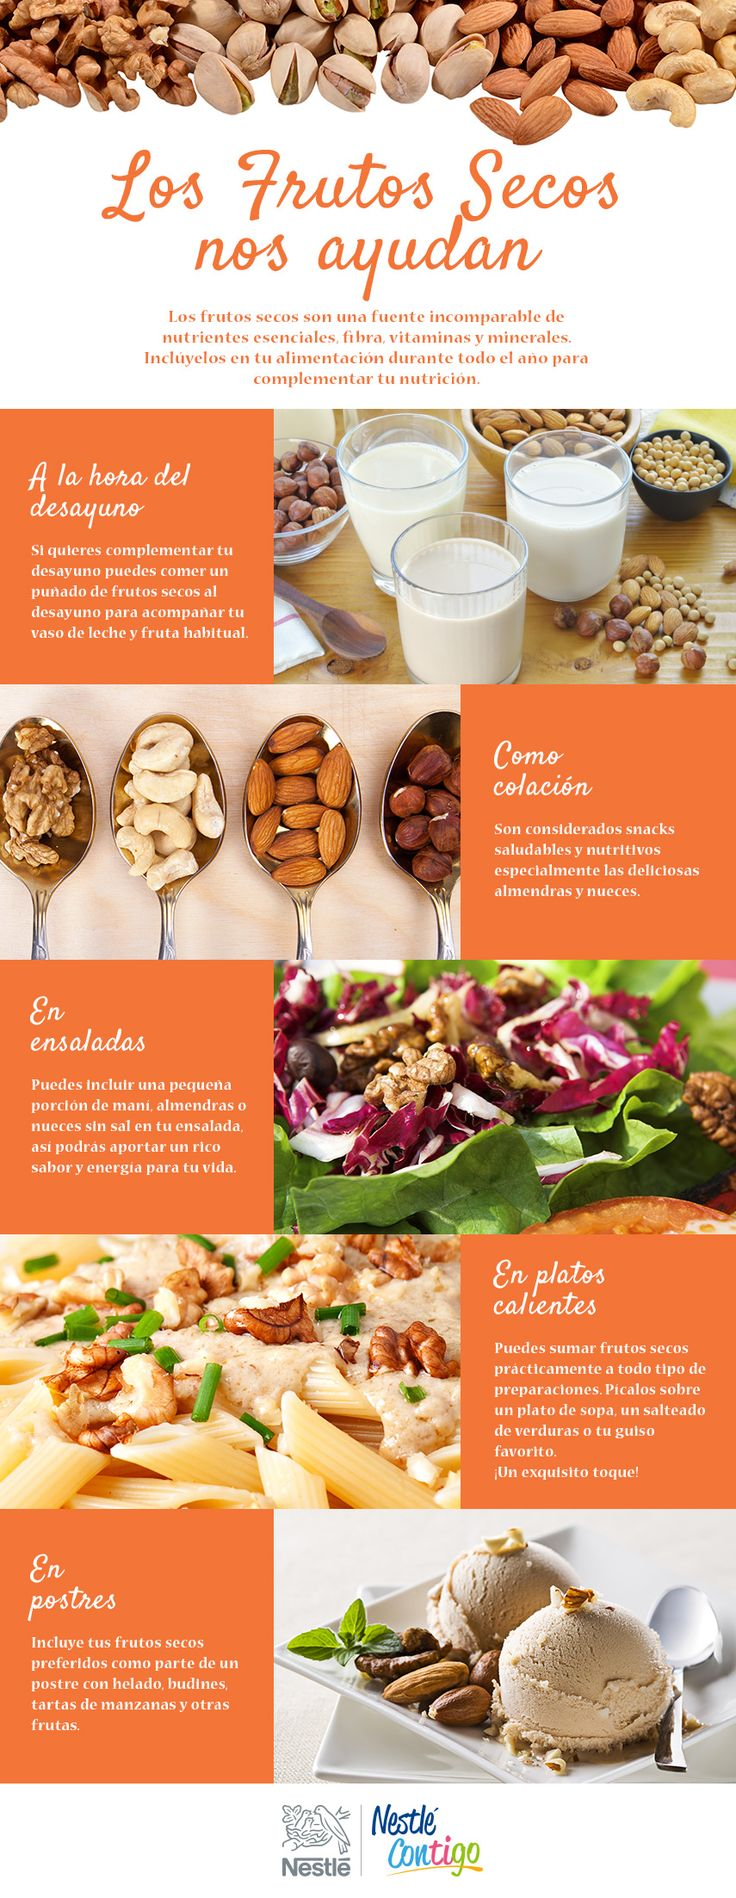 Los Frutos Secos nos ayudan | Mas nutricion | Nestlé Contigo